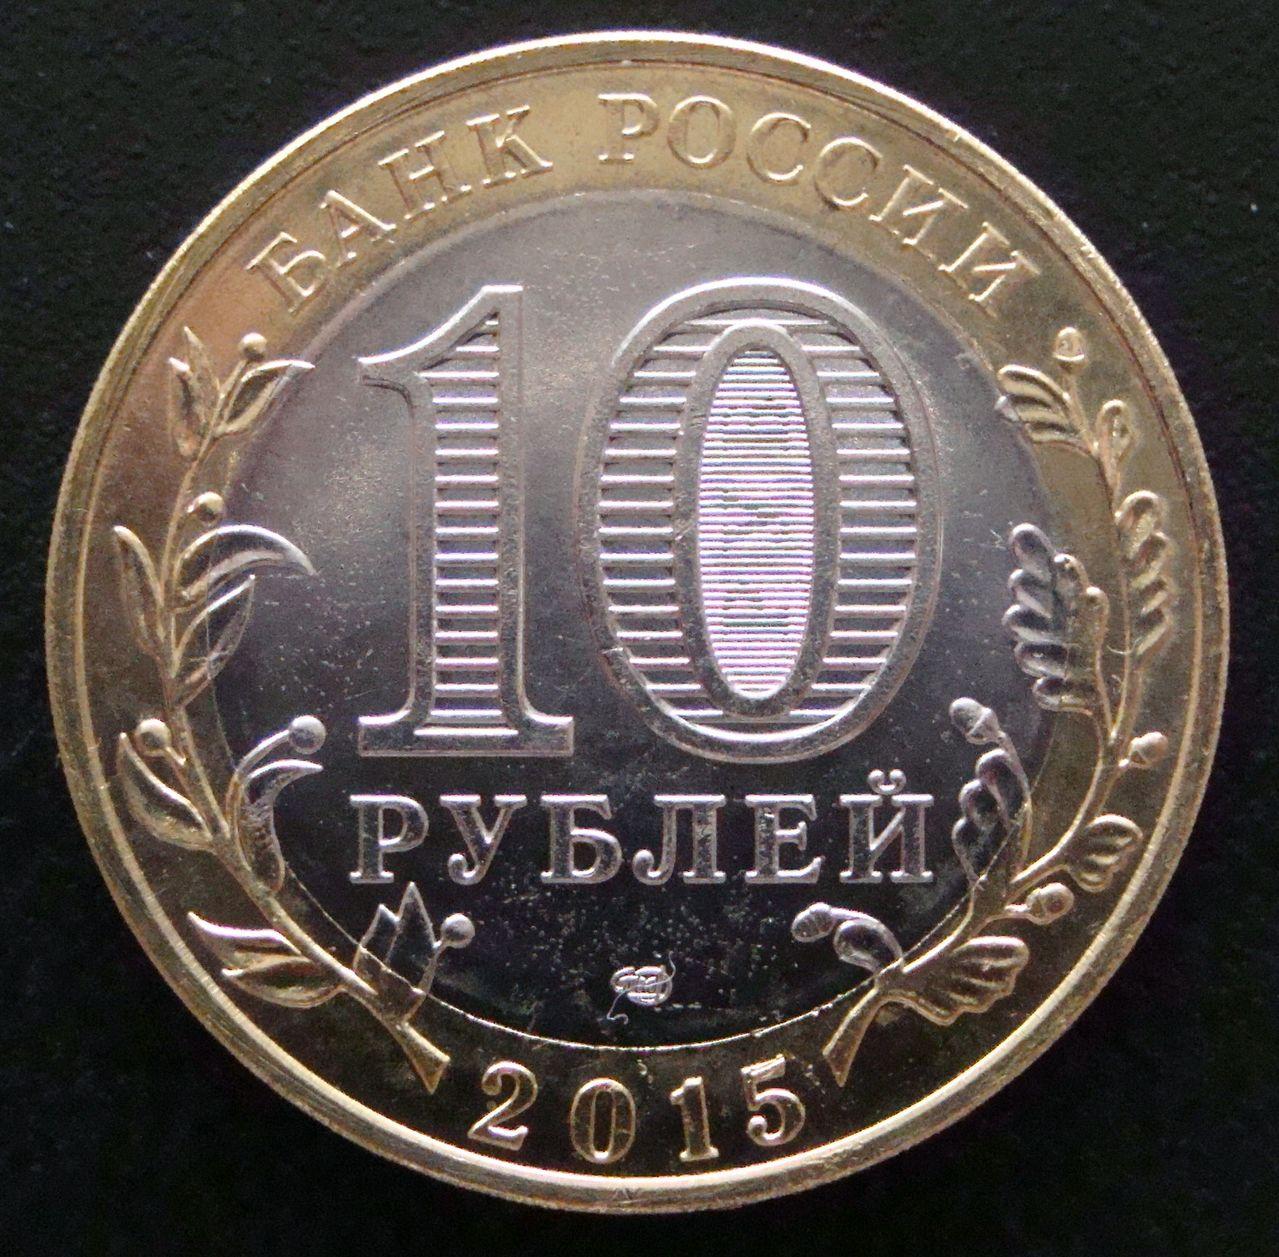 10 Rublos. Rusia (2015) 70 aniversario de la II Guerra Mundial RUS_10_Rublos_70_Aniv_II_G_M_anv